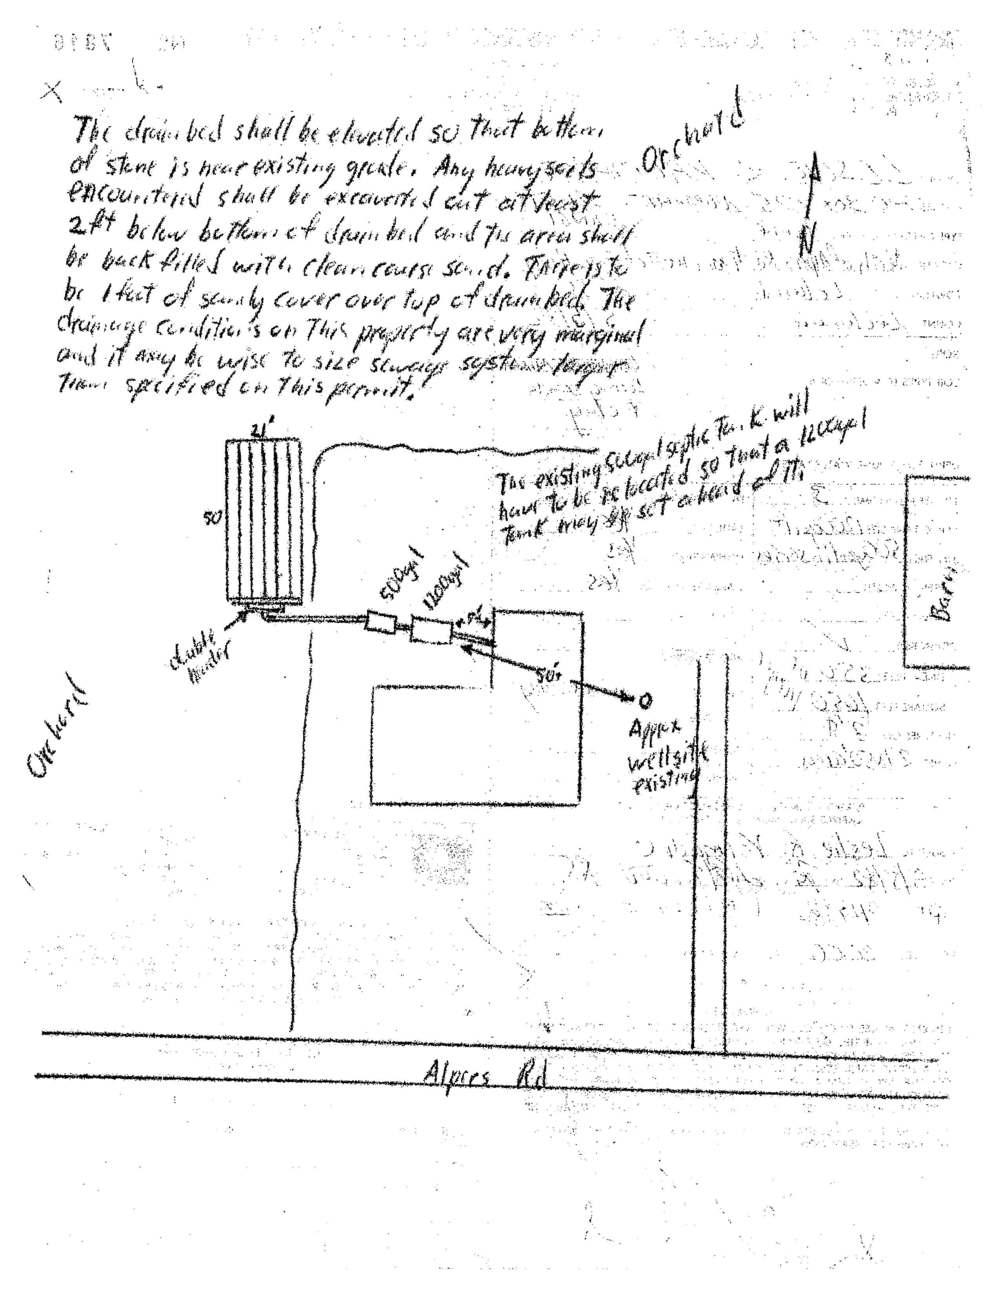 7251 E Alpers Road, Lake Leelanau, MI – Historic 1865 Centennial Inn For Sale By Oltersdorf Realty LLC Information Packet (18).jpg